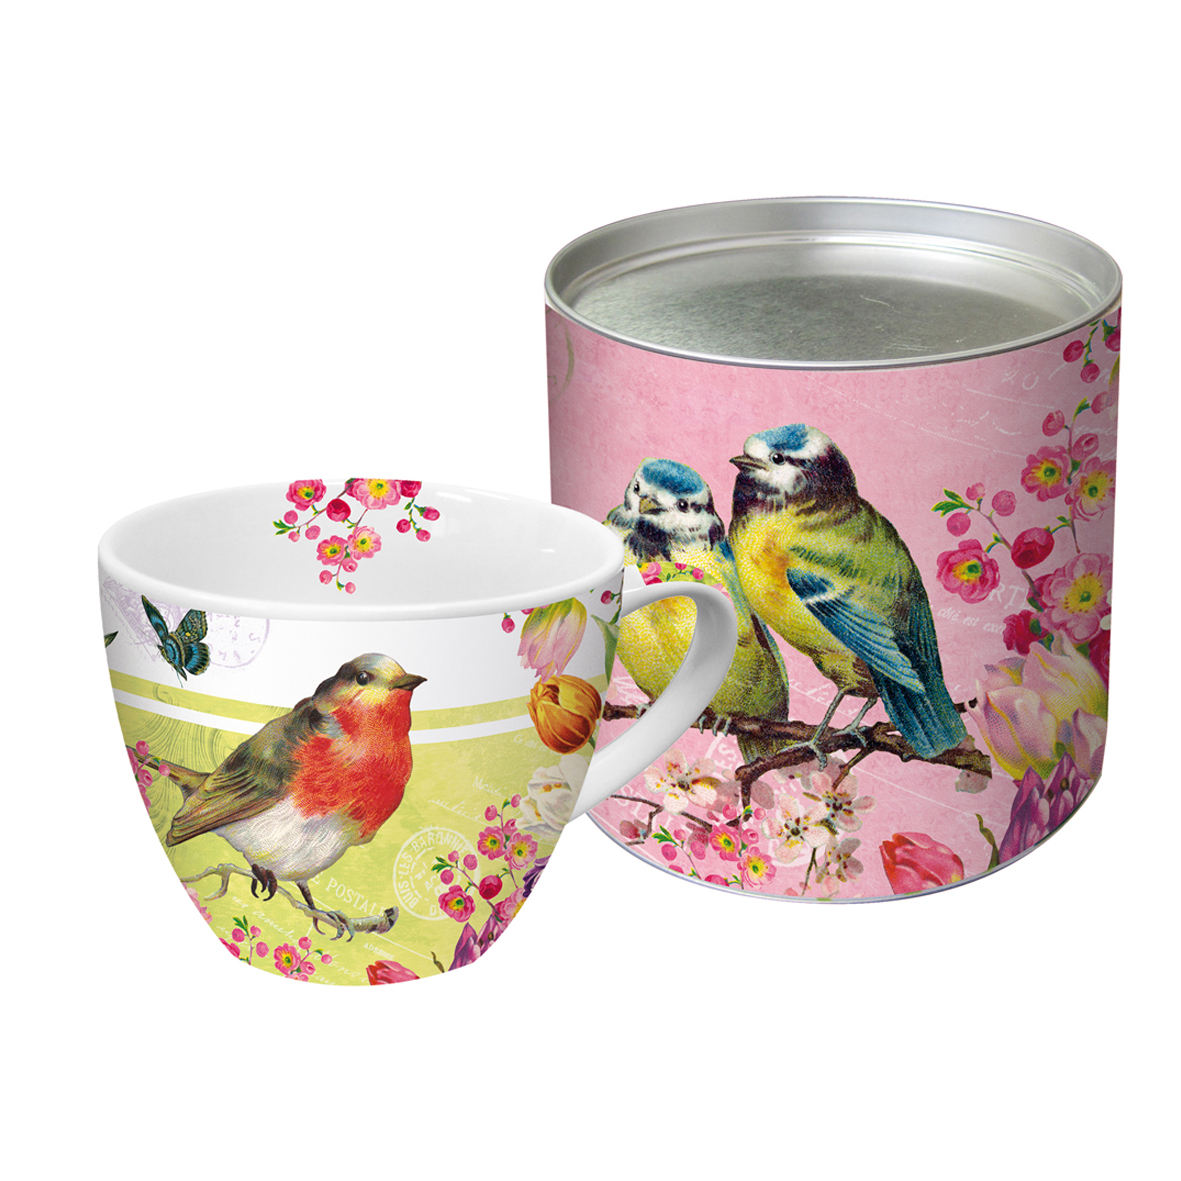 grand mug en porcelaine oiseau jaune art de la table mug tasse lulu shop. Black Bedroom Furniture Sets. Home Design Ideas